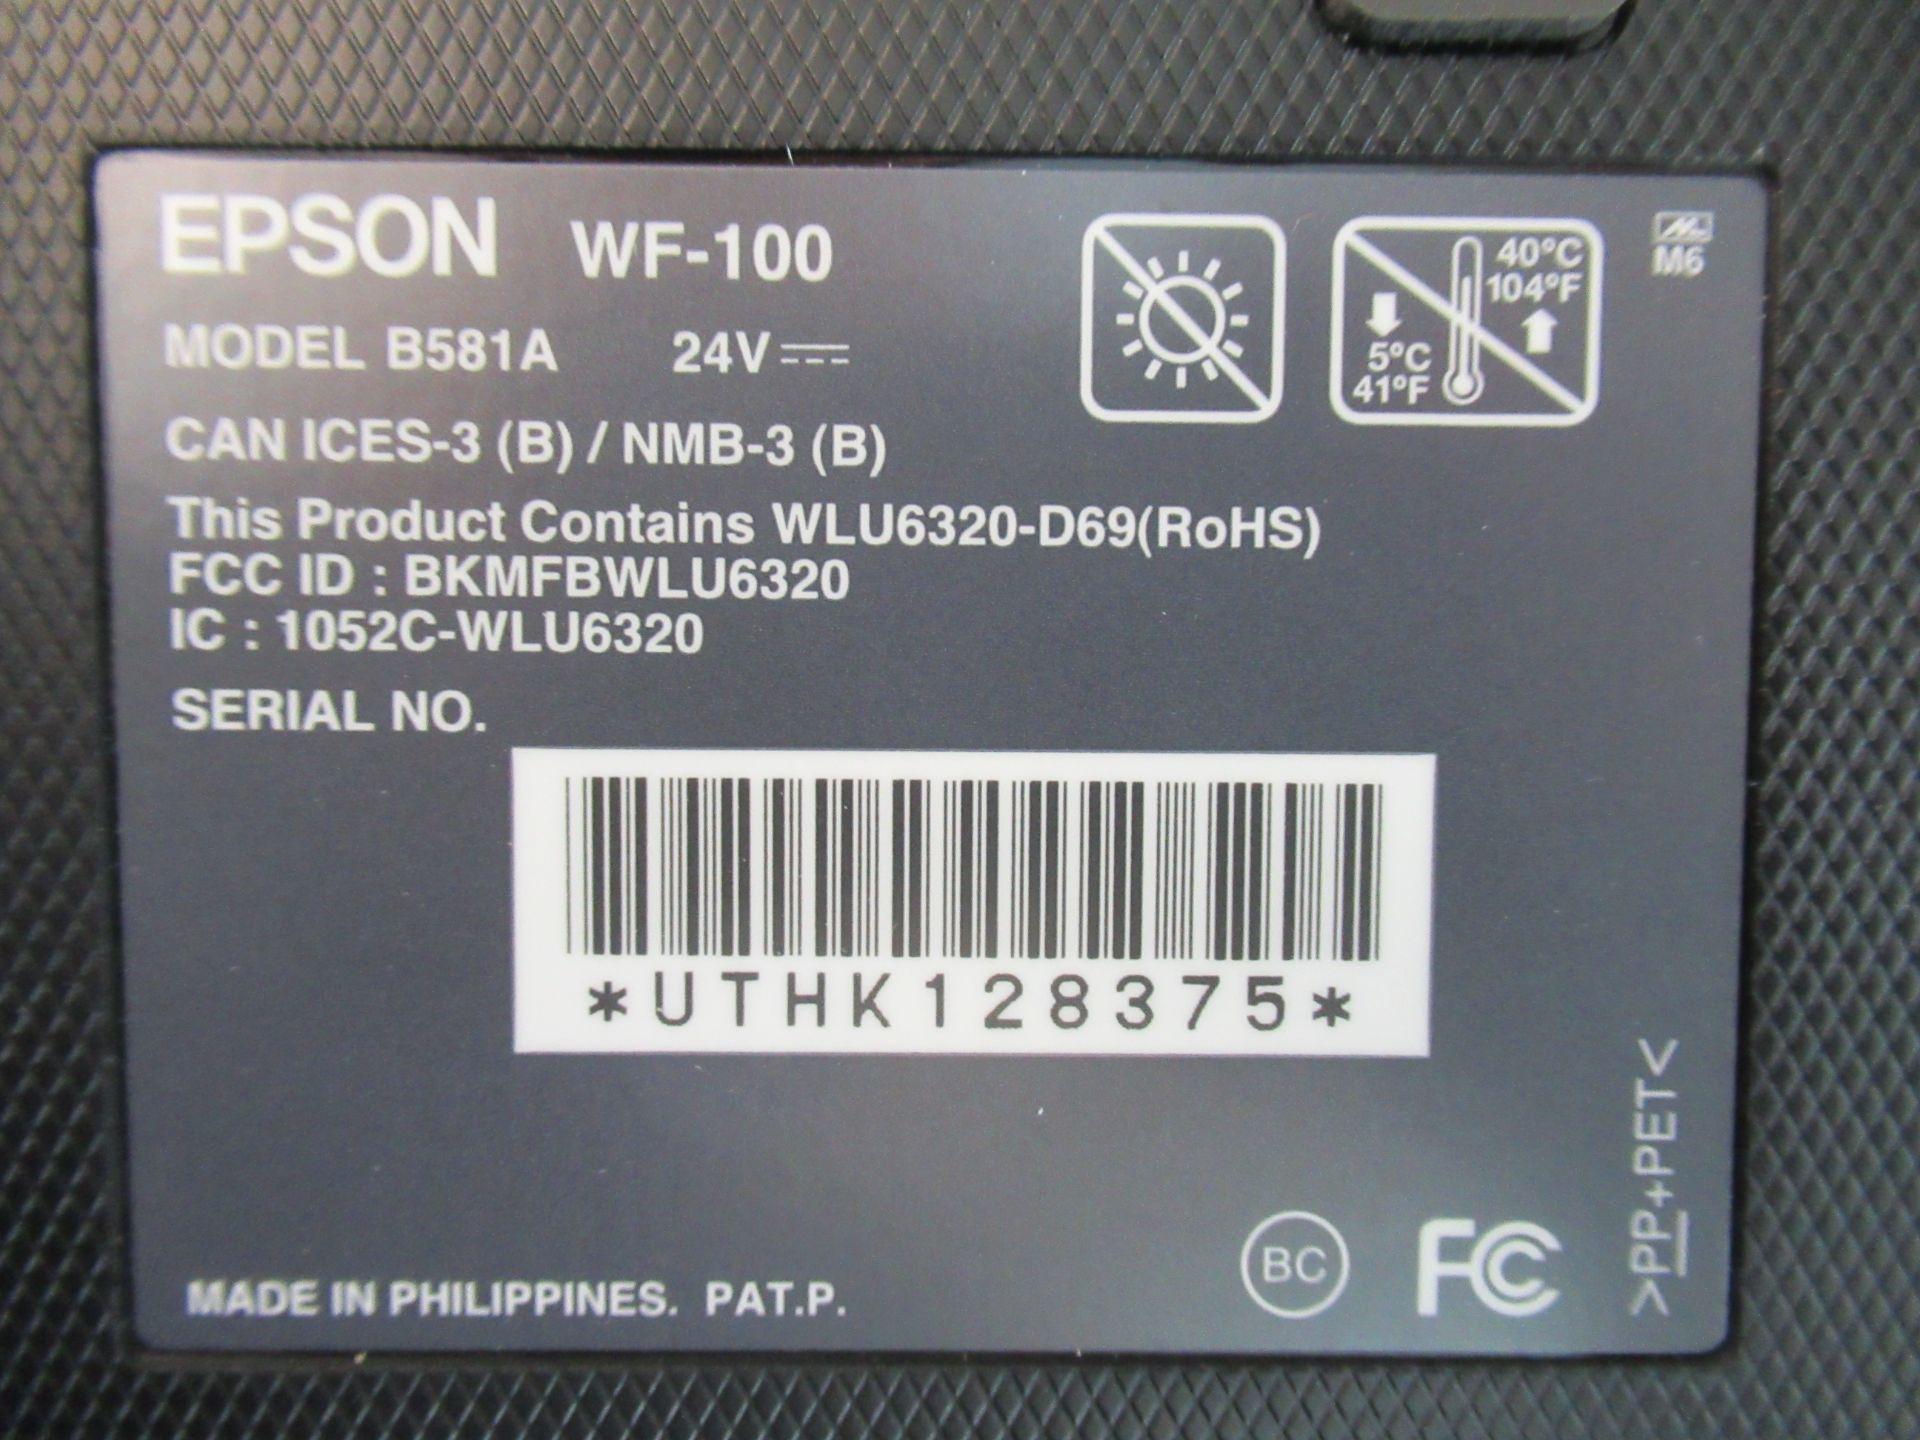 Lot 6223 - EPSON WORKFORCE, WF100, WIRELESS MOBILE PRINTER (REUTER)